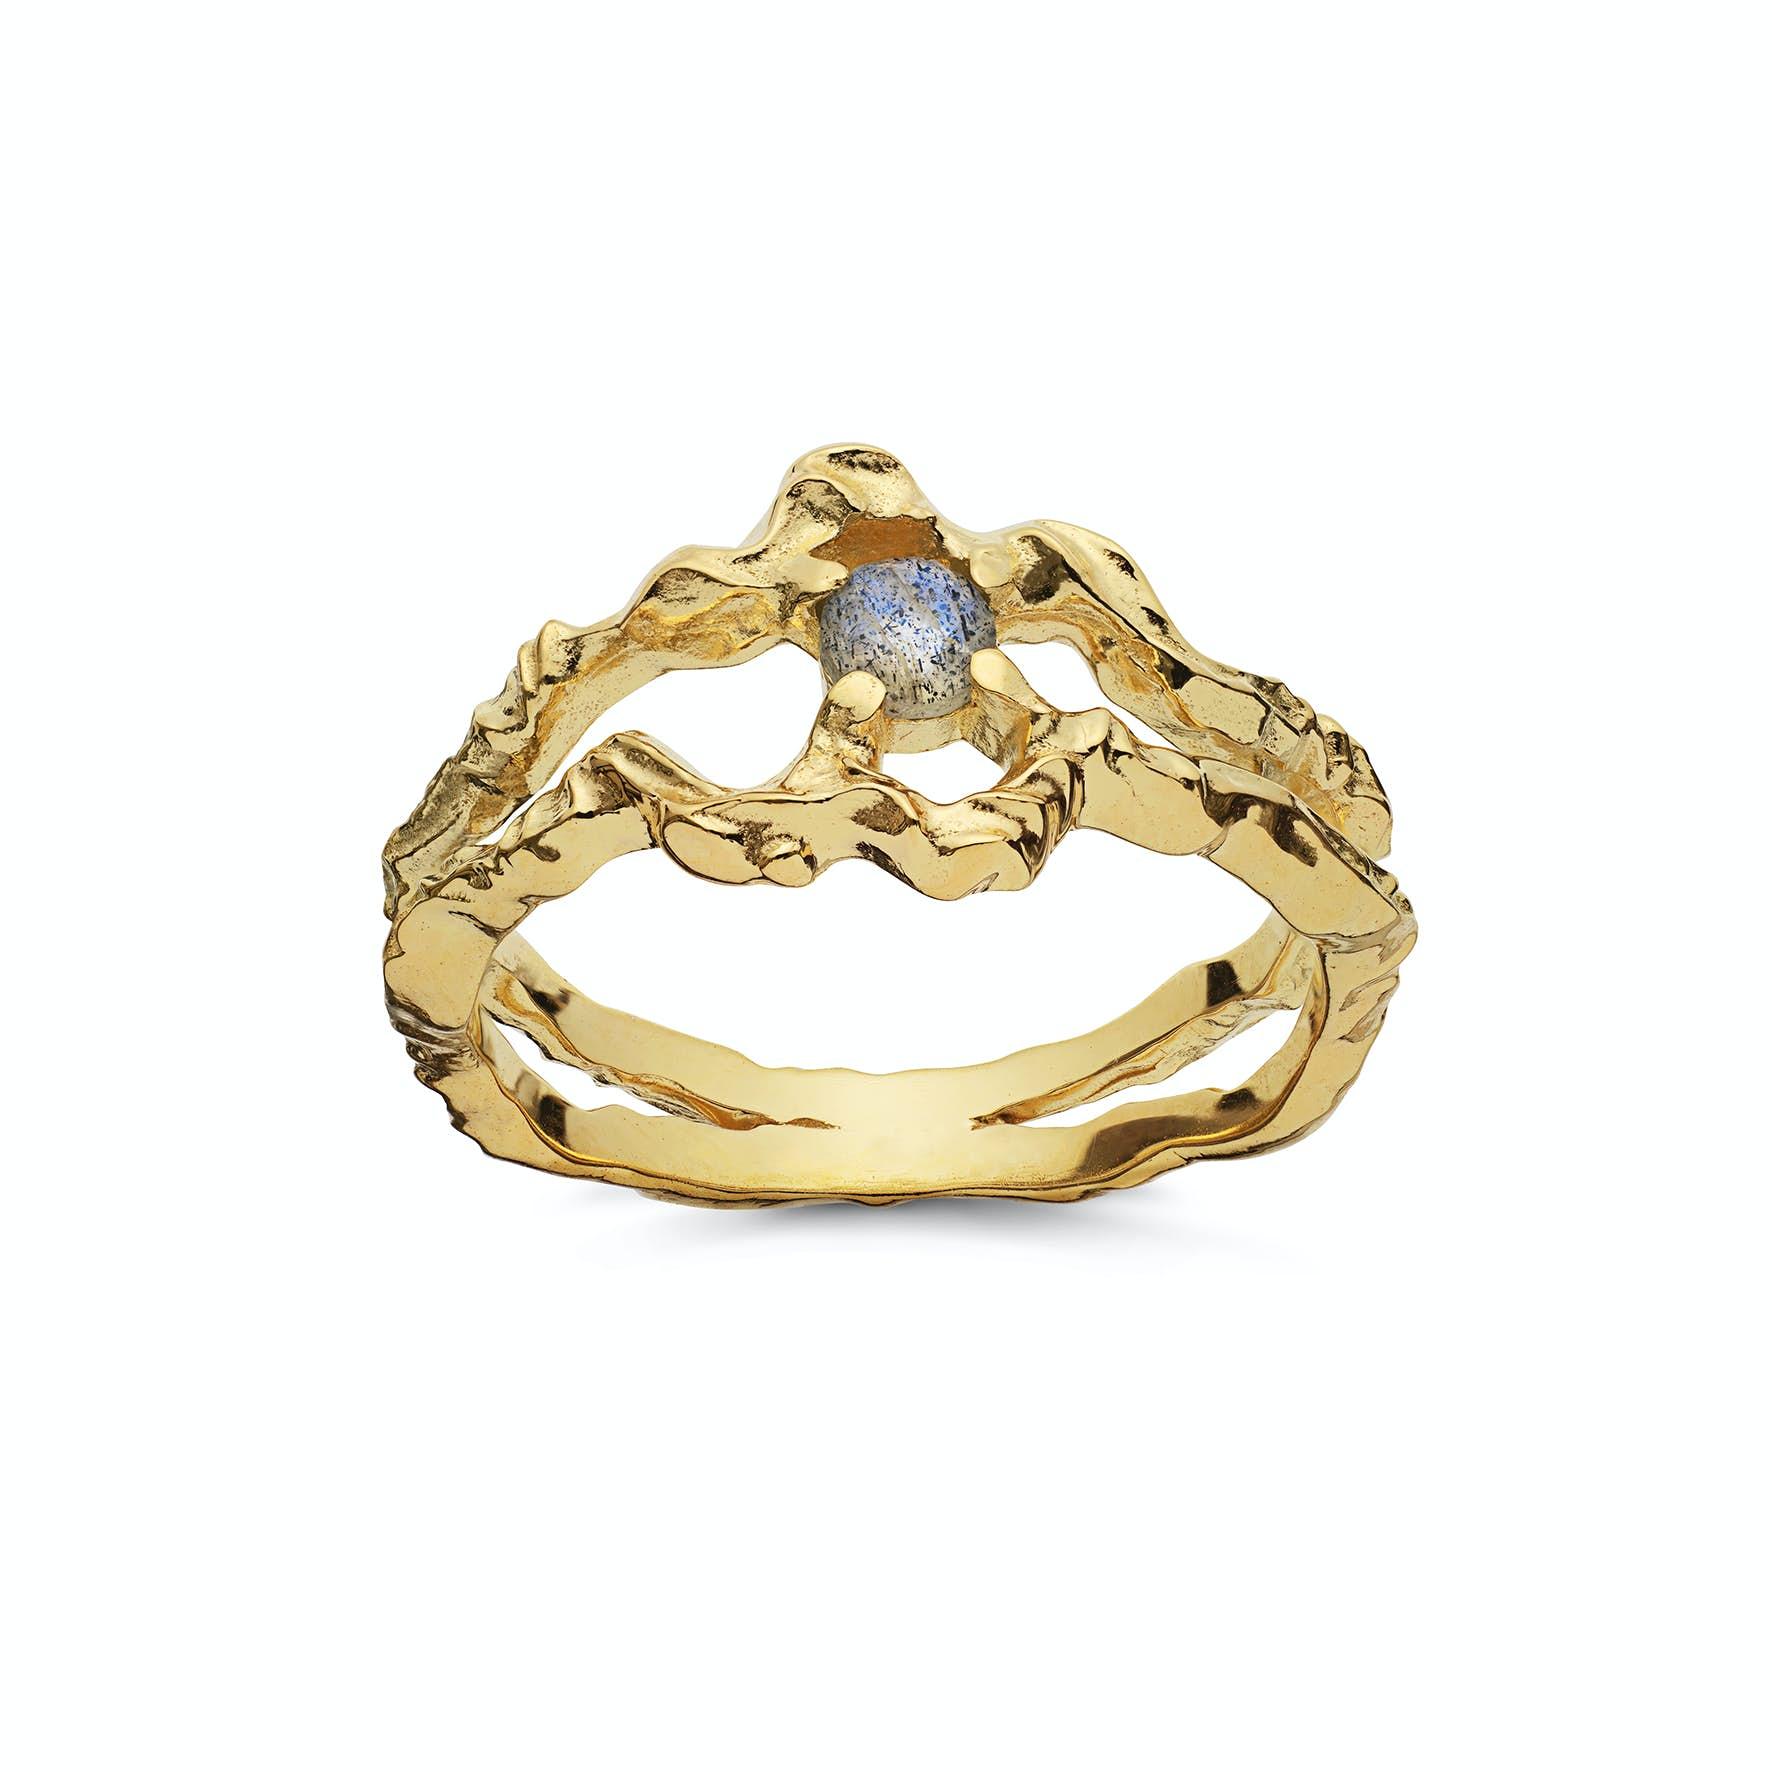 Shelly Ring von Maanesten in Vergoldet-Silber Sterling 925